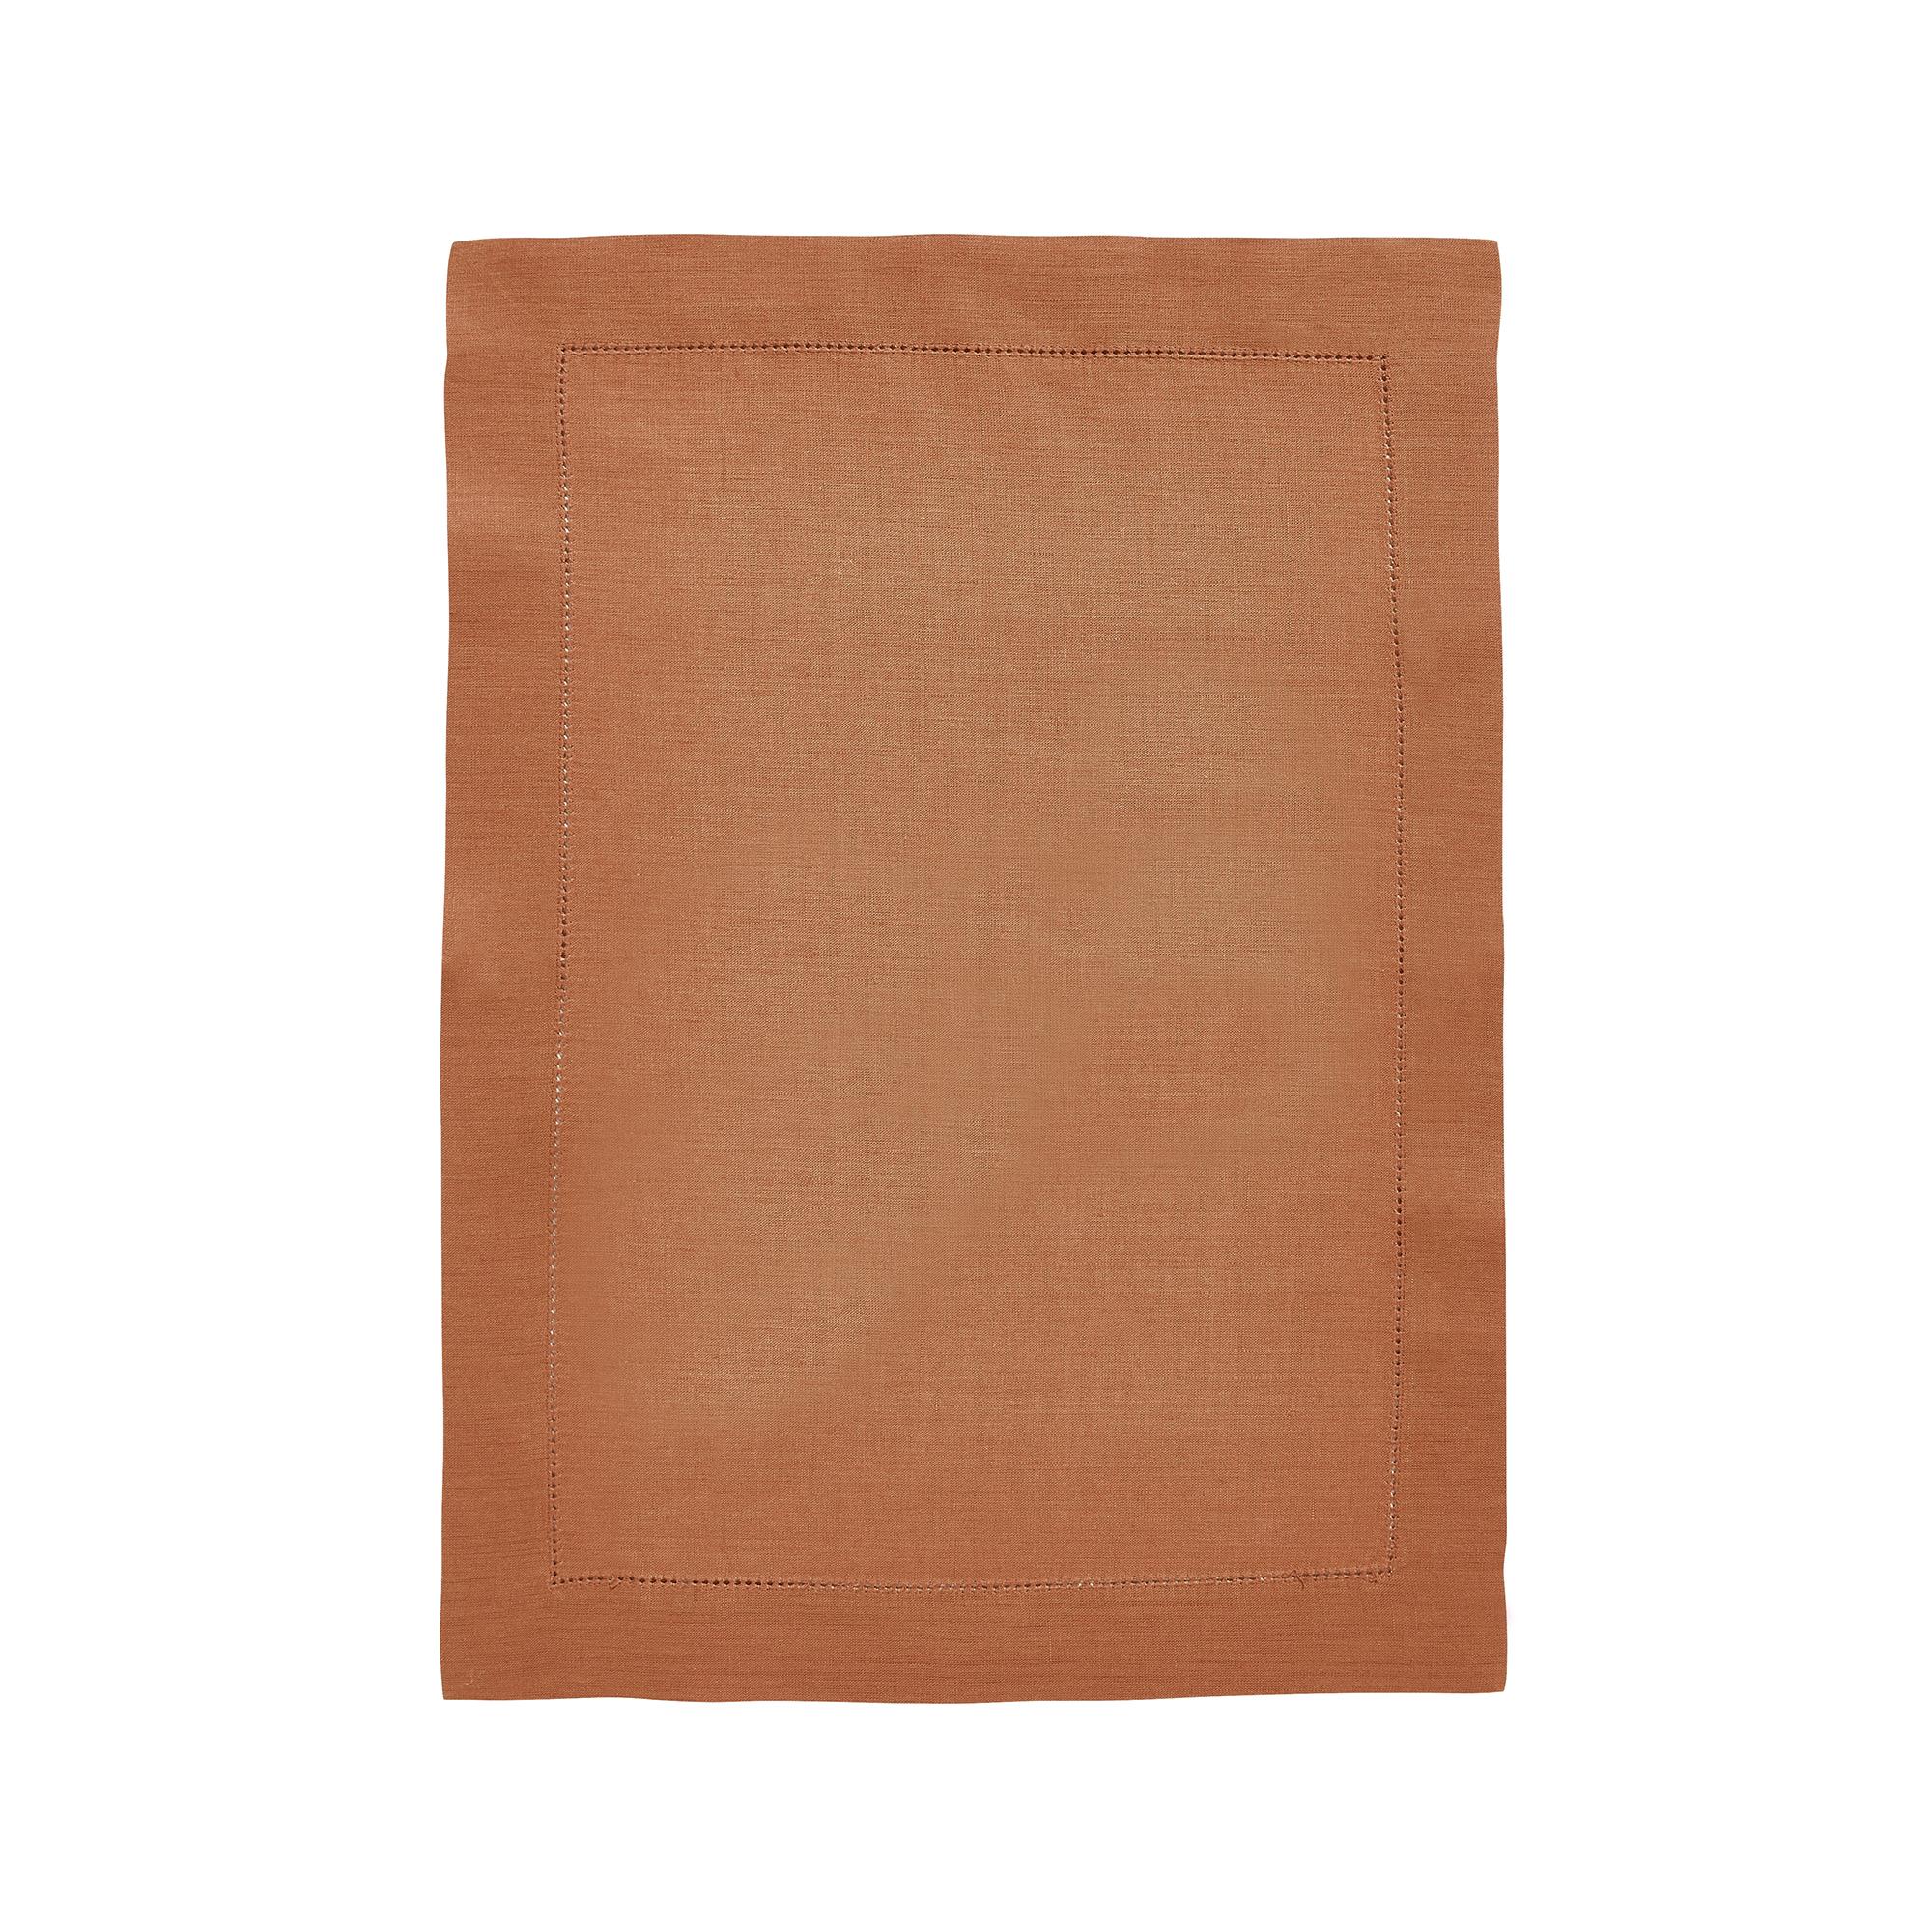 Set de table en lin marron cuivre 37x50